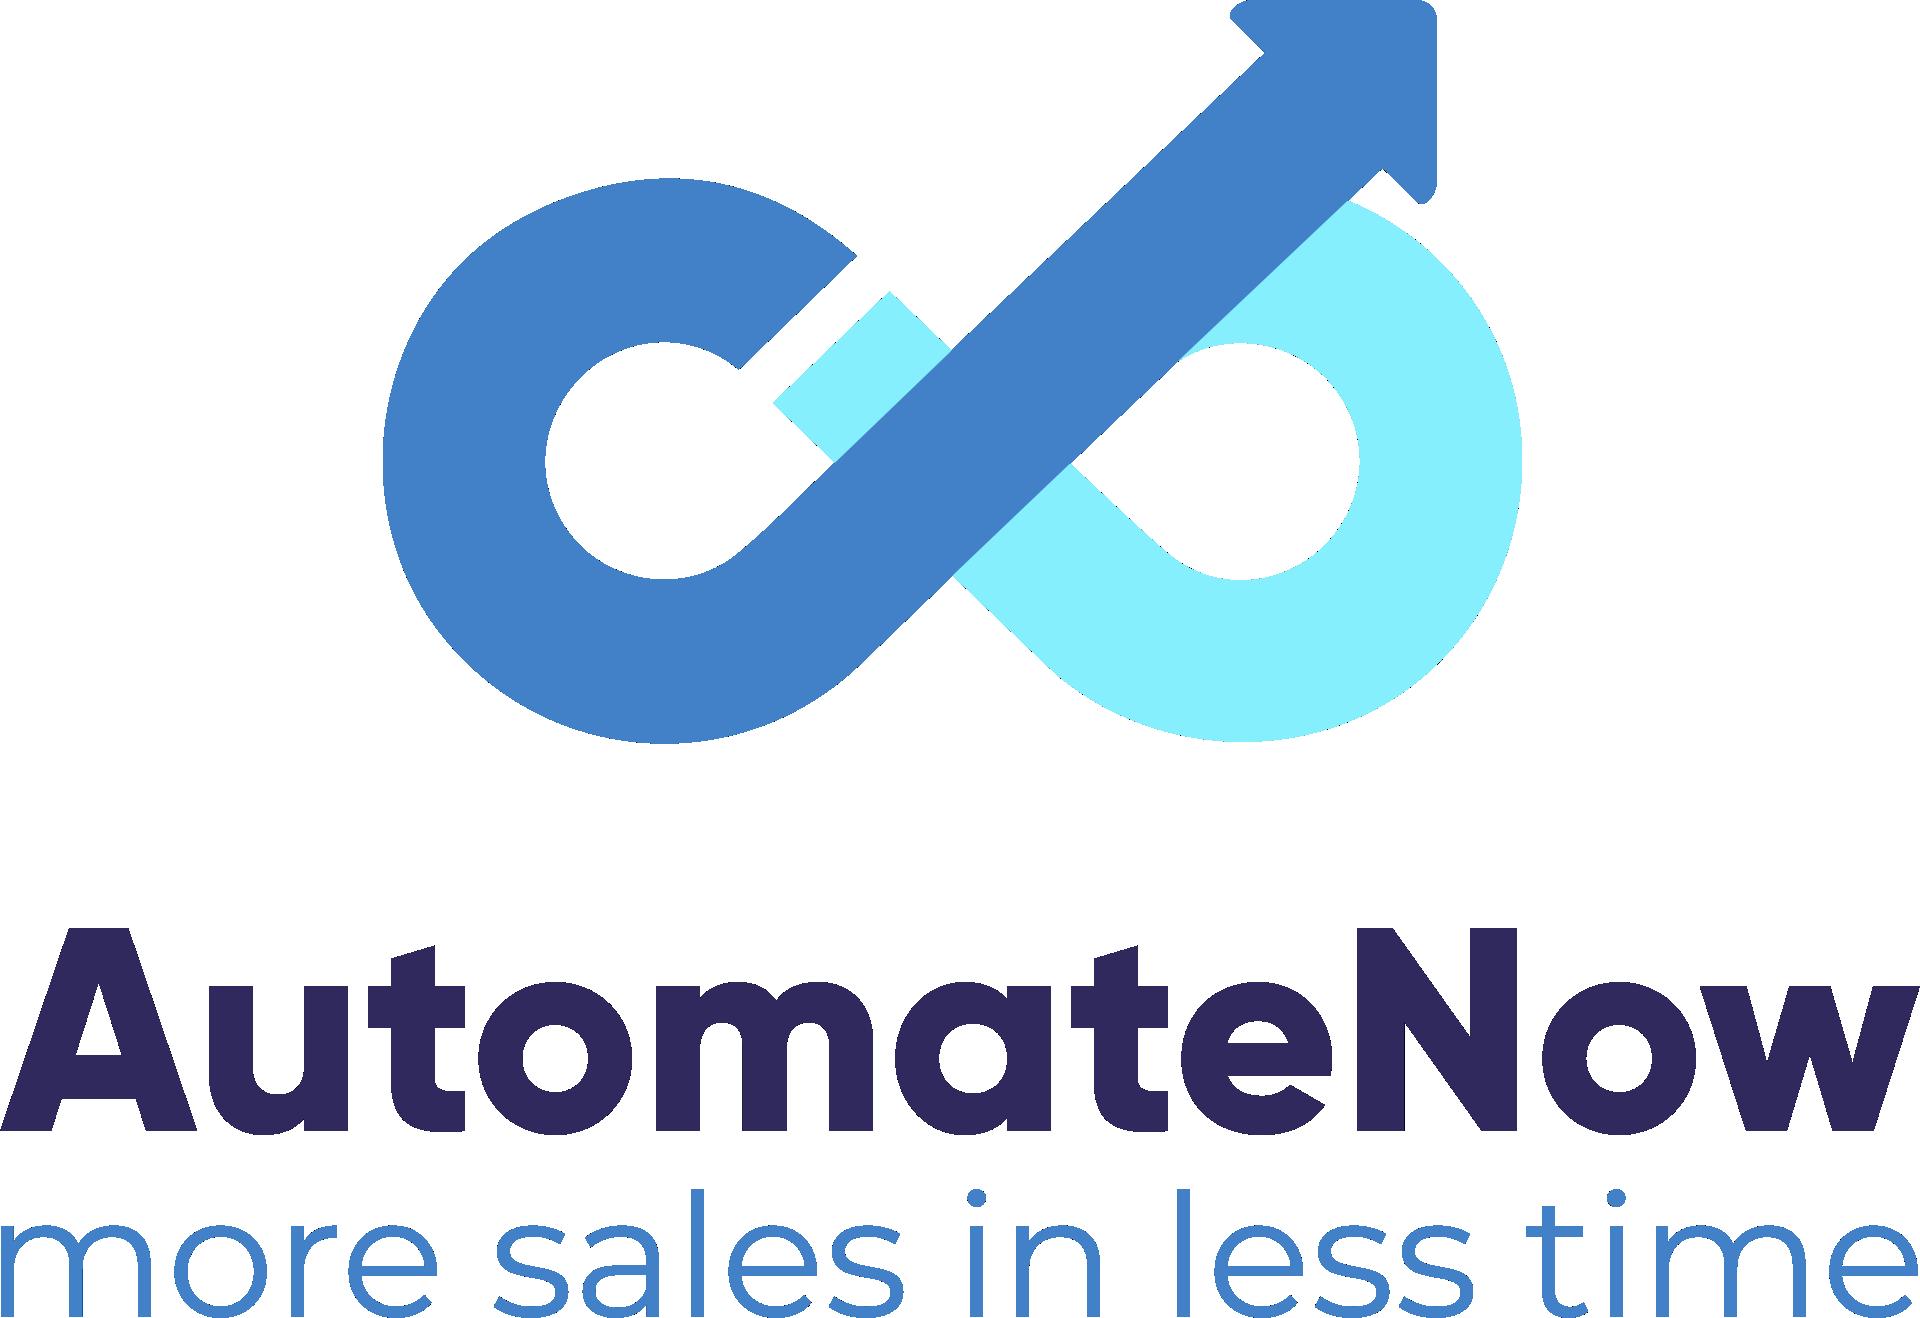 automatenow_logo_color-1